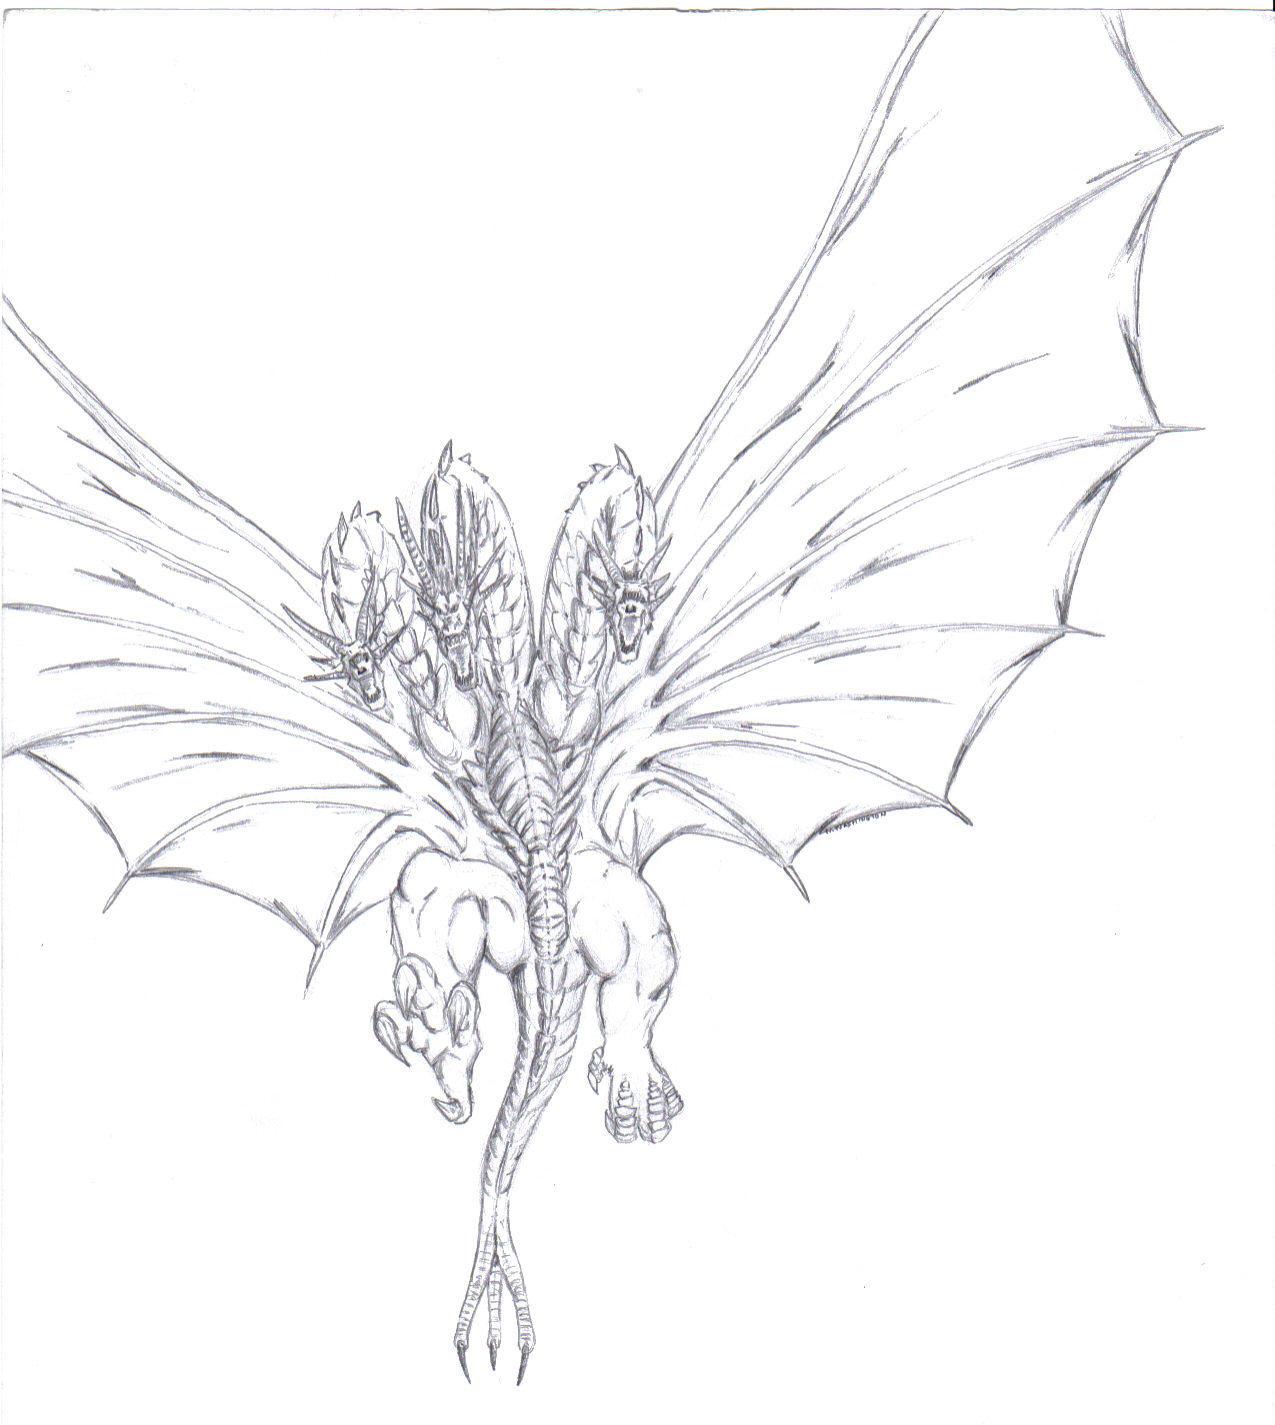 King Ghidorah by MikeDastardly on deviantART